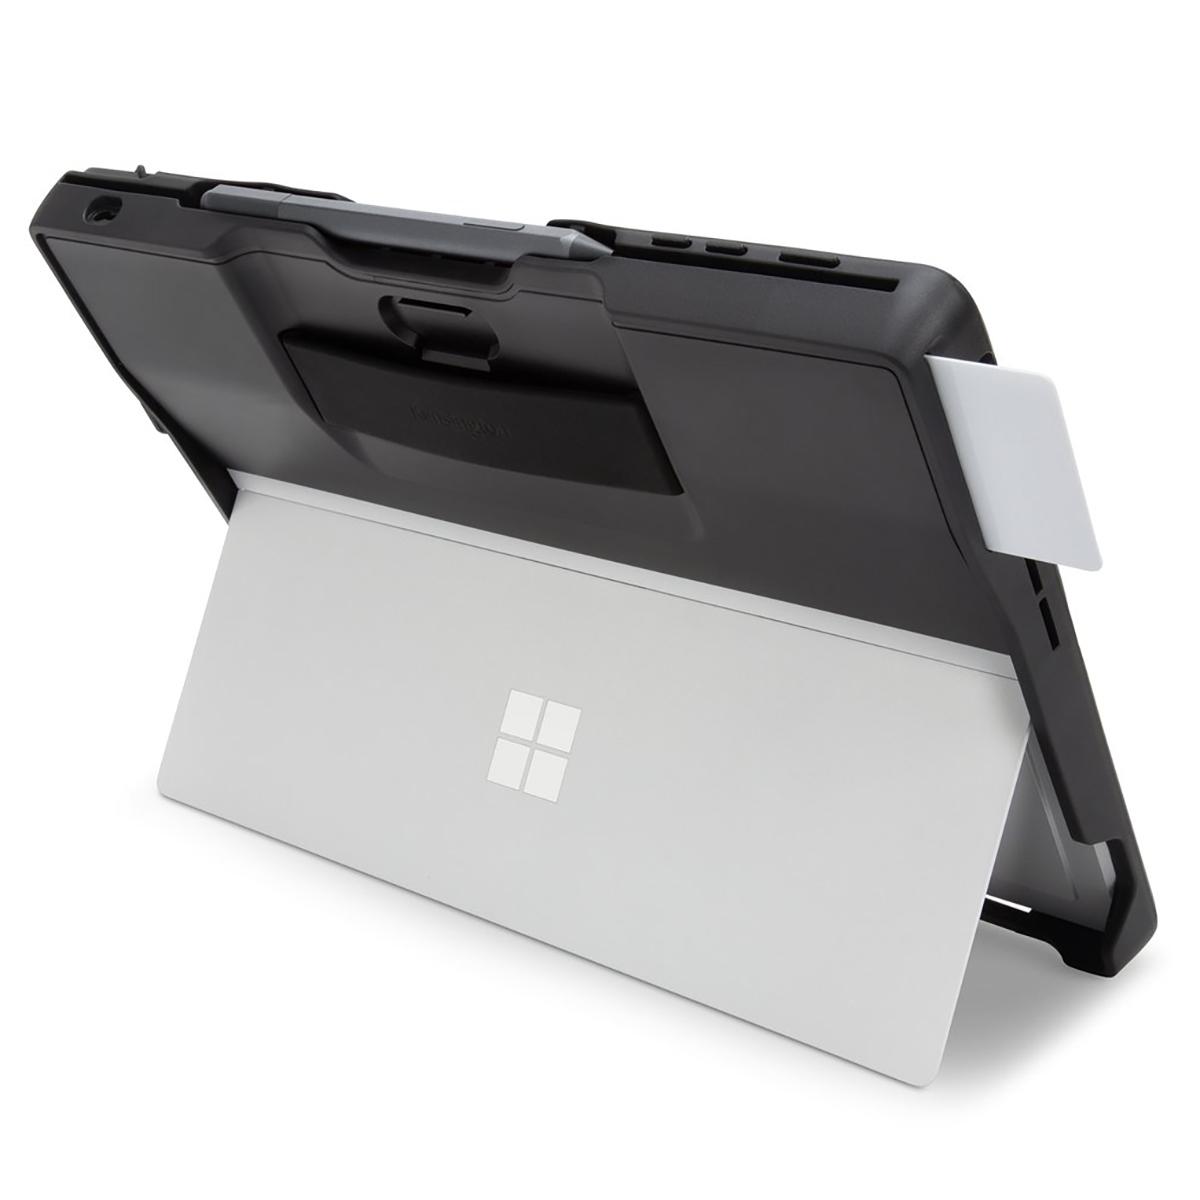 Kensington K97550WW BlackBelt Rugged Case for Surface Pro 7plus, 7, 6, 5, and 4